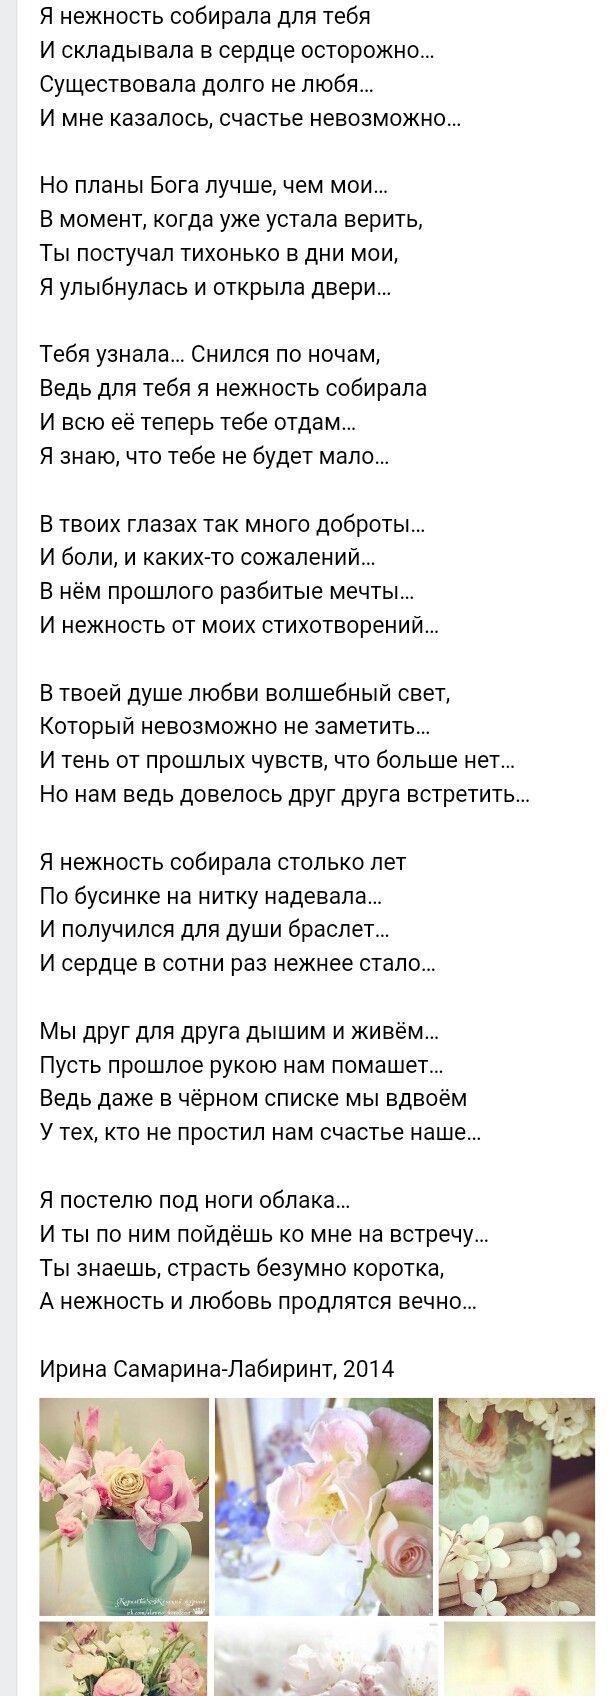 Стих всю нежность собирал я для тебя